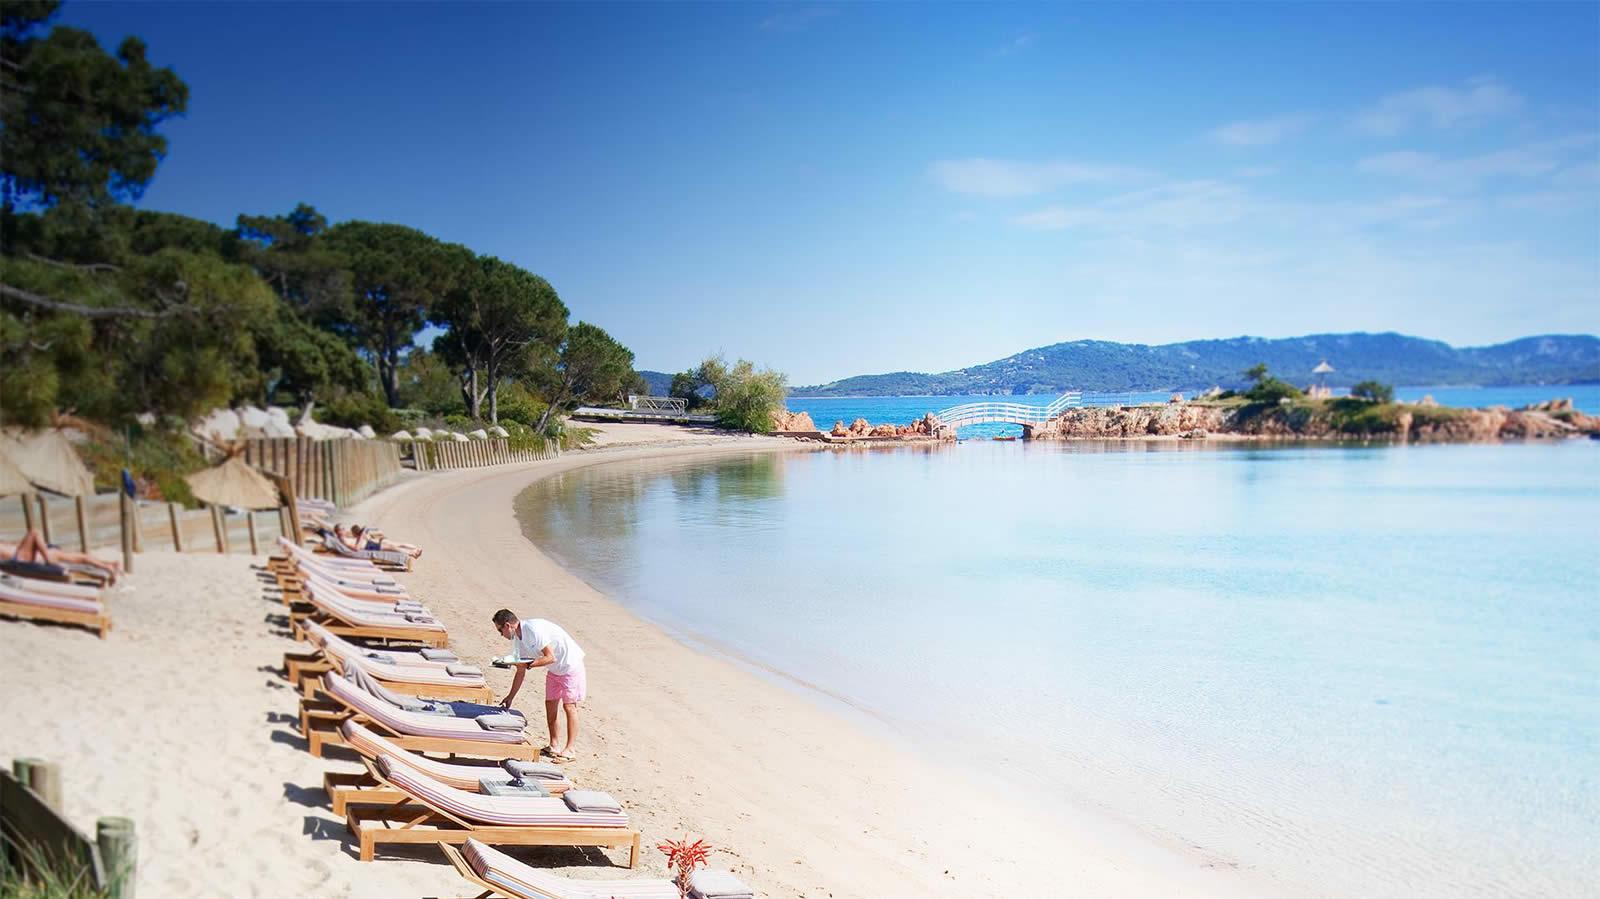 grand-hotel-luxe-spa-restaurant-gastronomie-ile-privee-plage